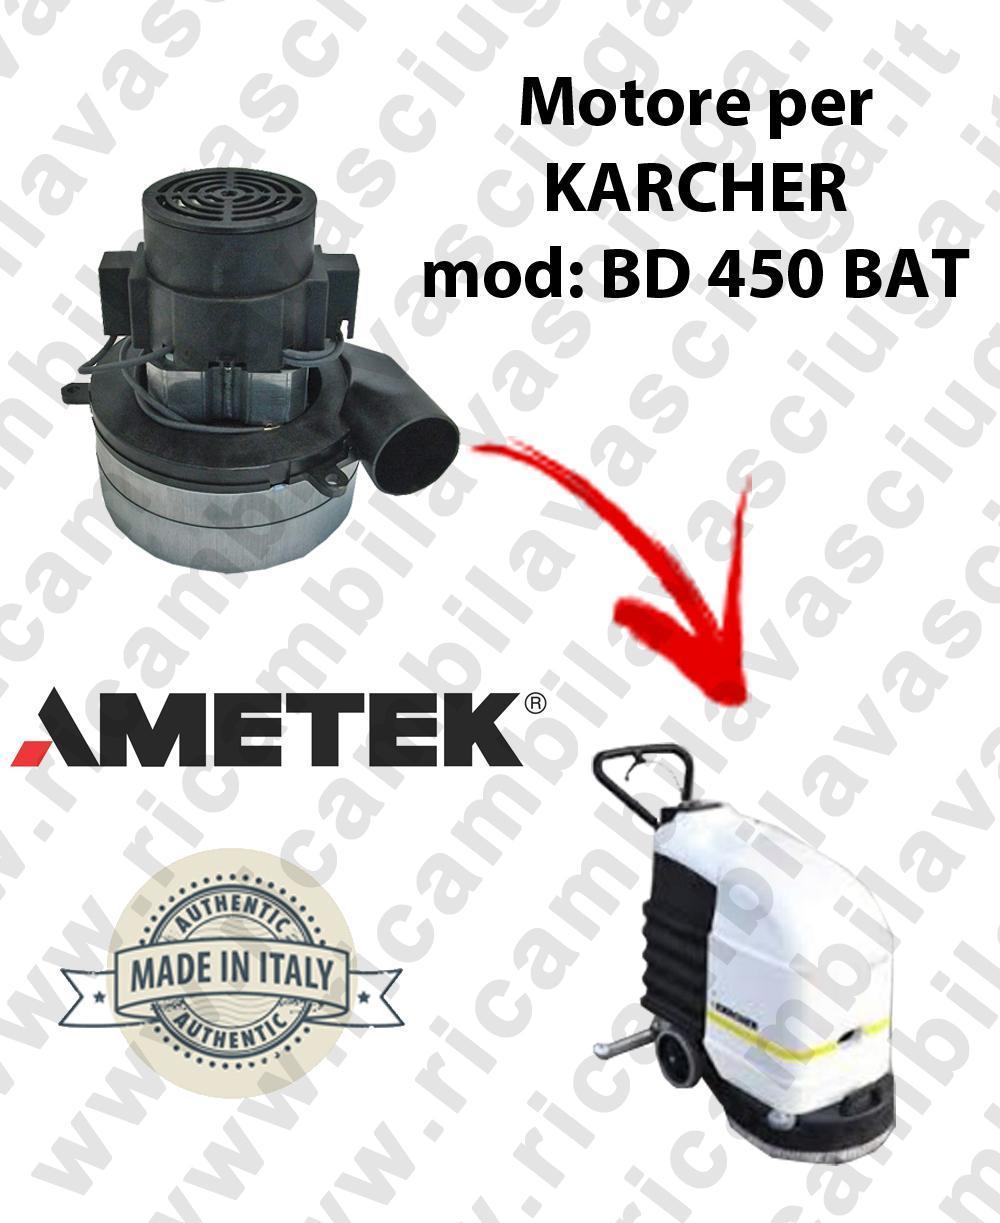 BD 450 BATT Saugmotor AMETEK für scheuersaugmaschinen KARCHER